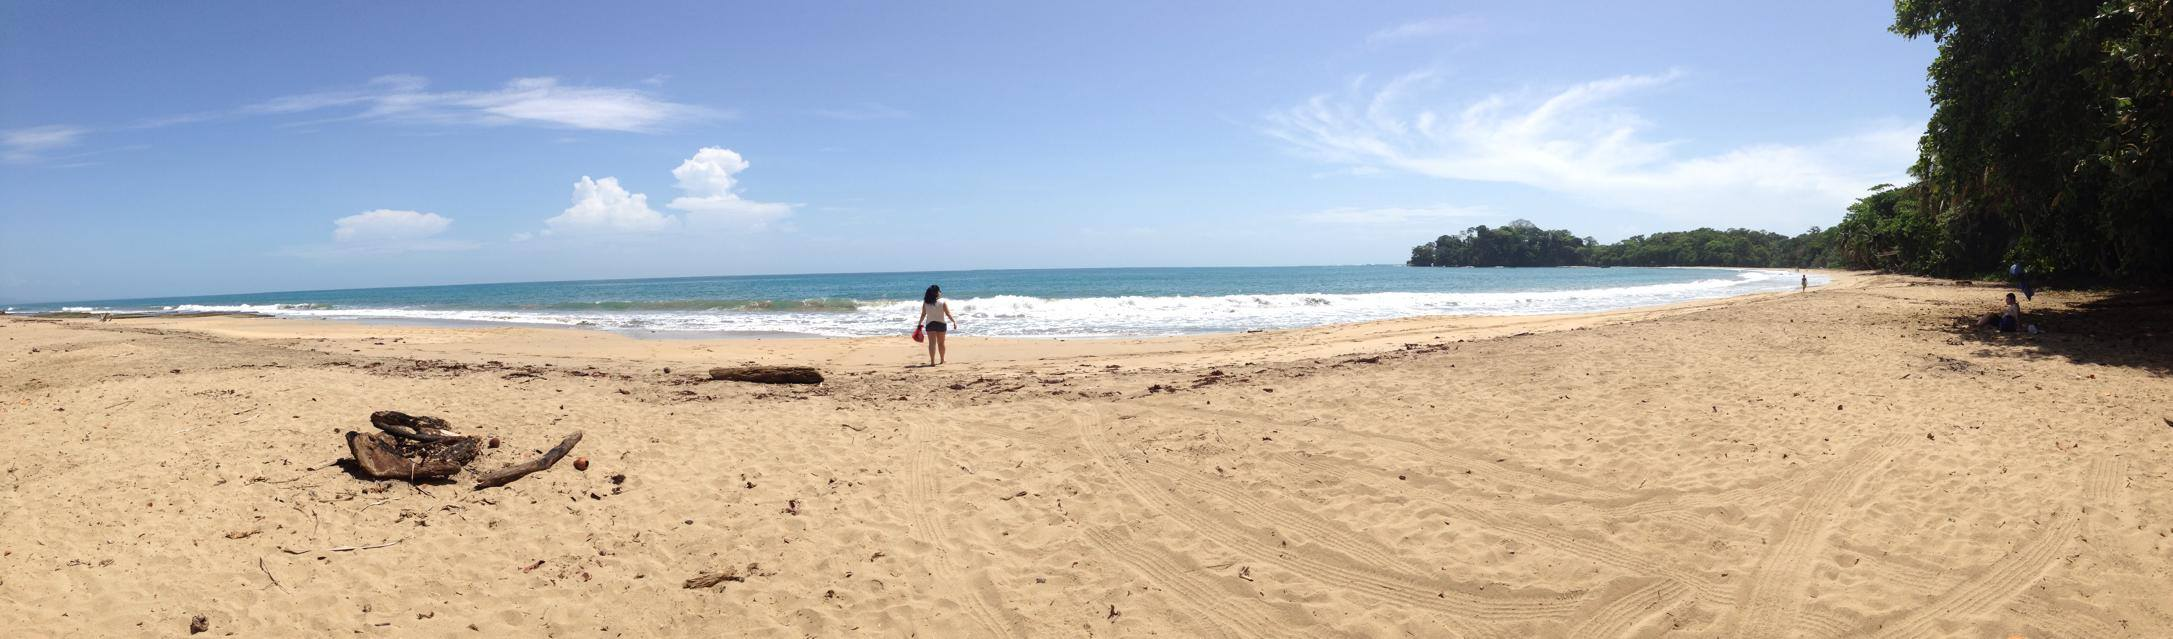 PV beach 3.jpg